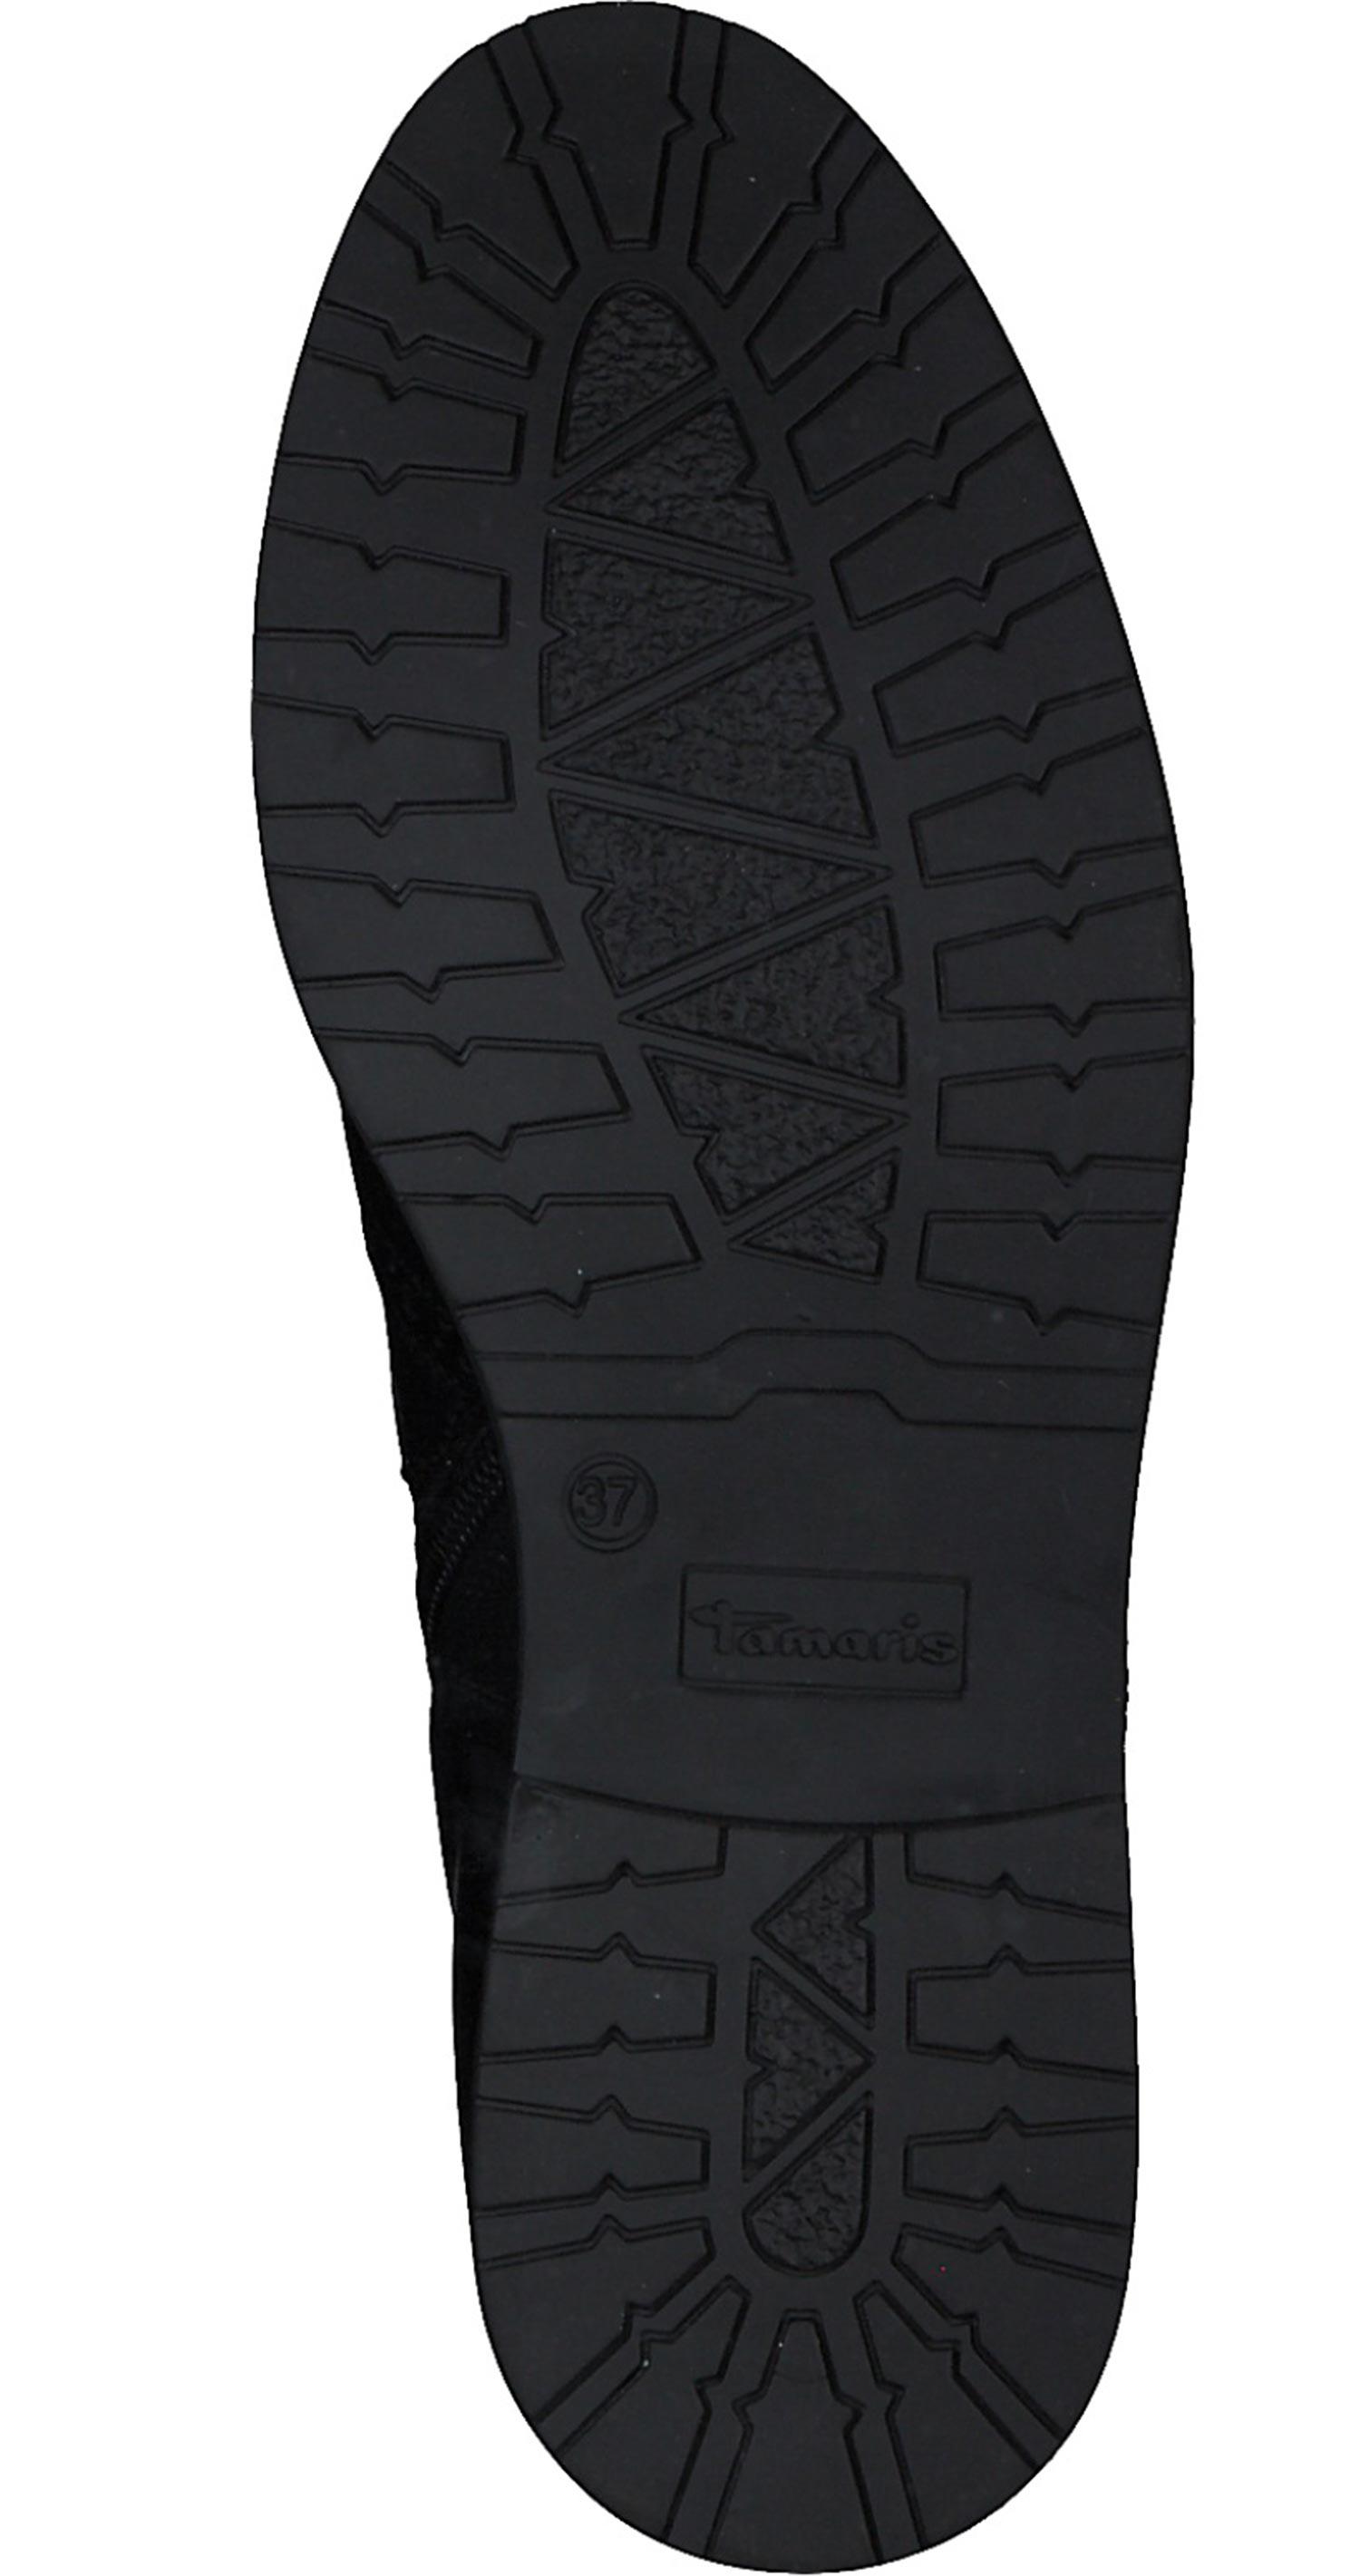 Tamaris-Women-039-s-Boots-Ankle-Boots-Winter-25004-21-007-Black-New thumbnail 5